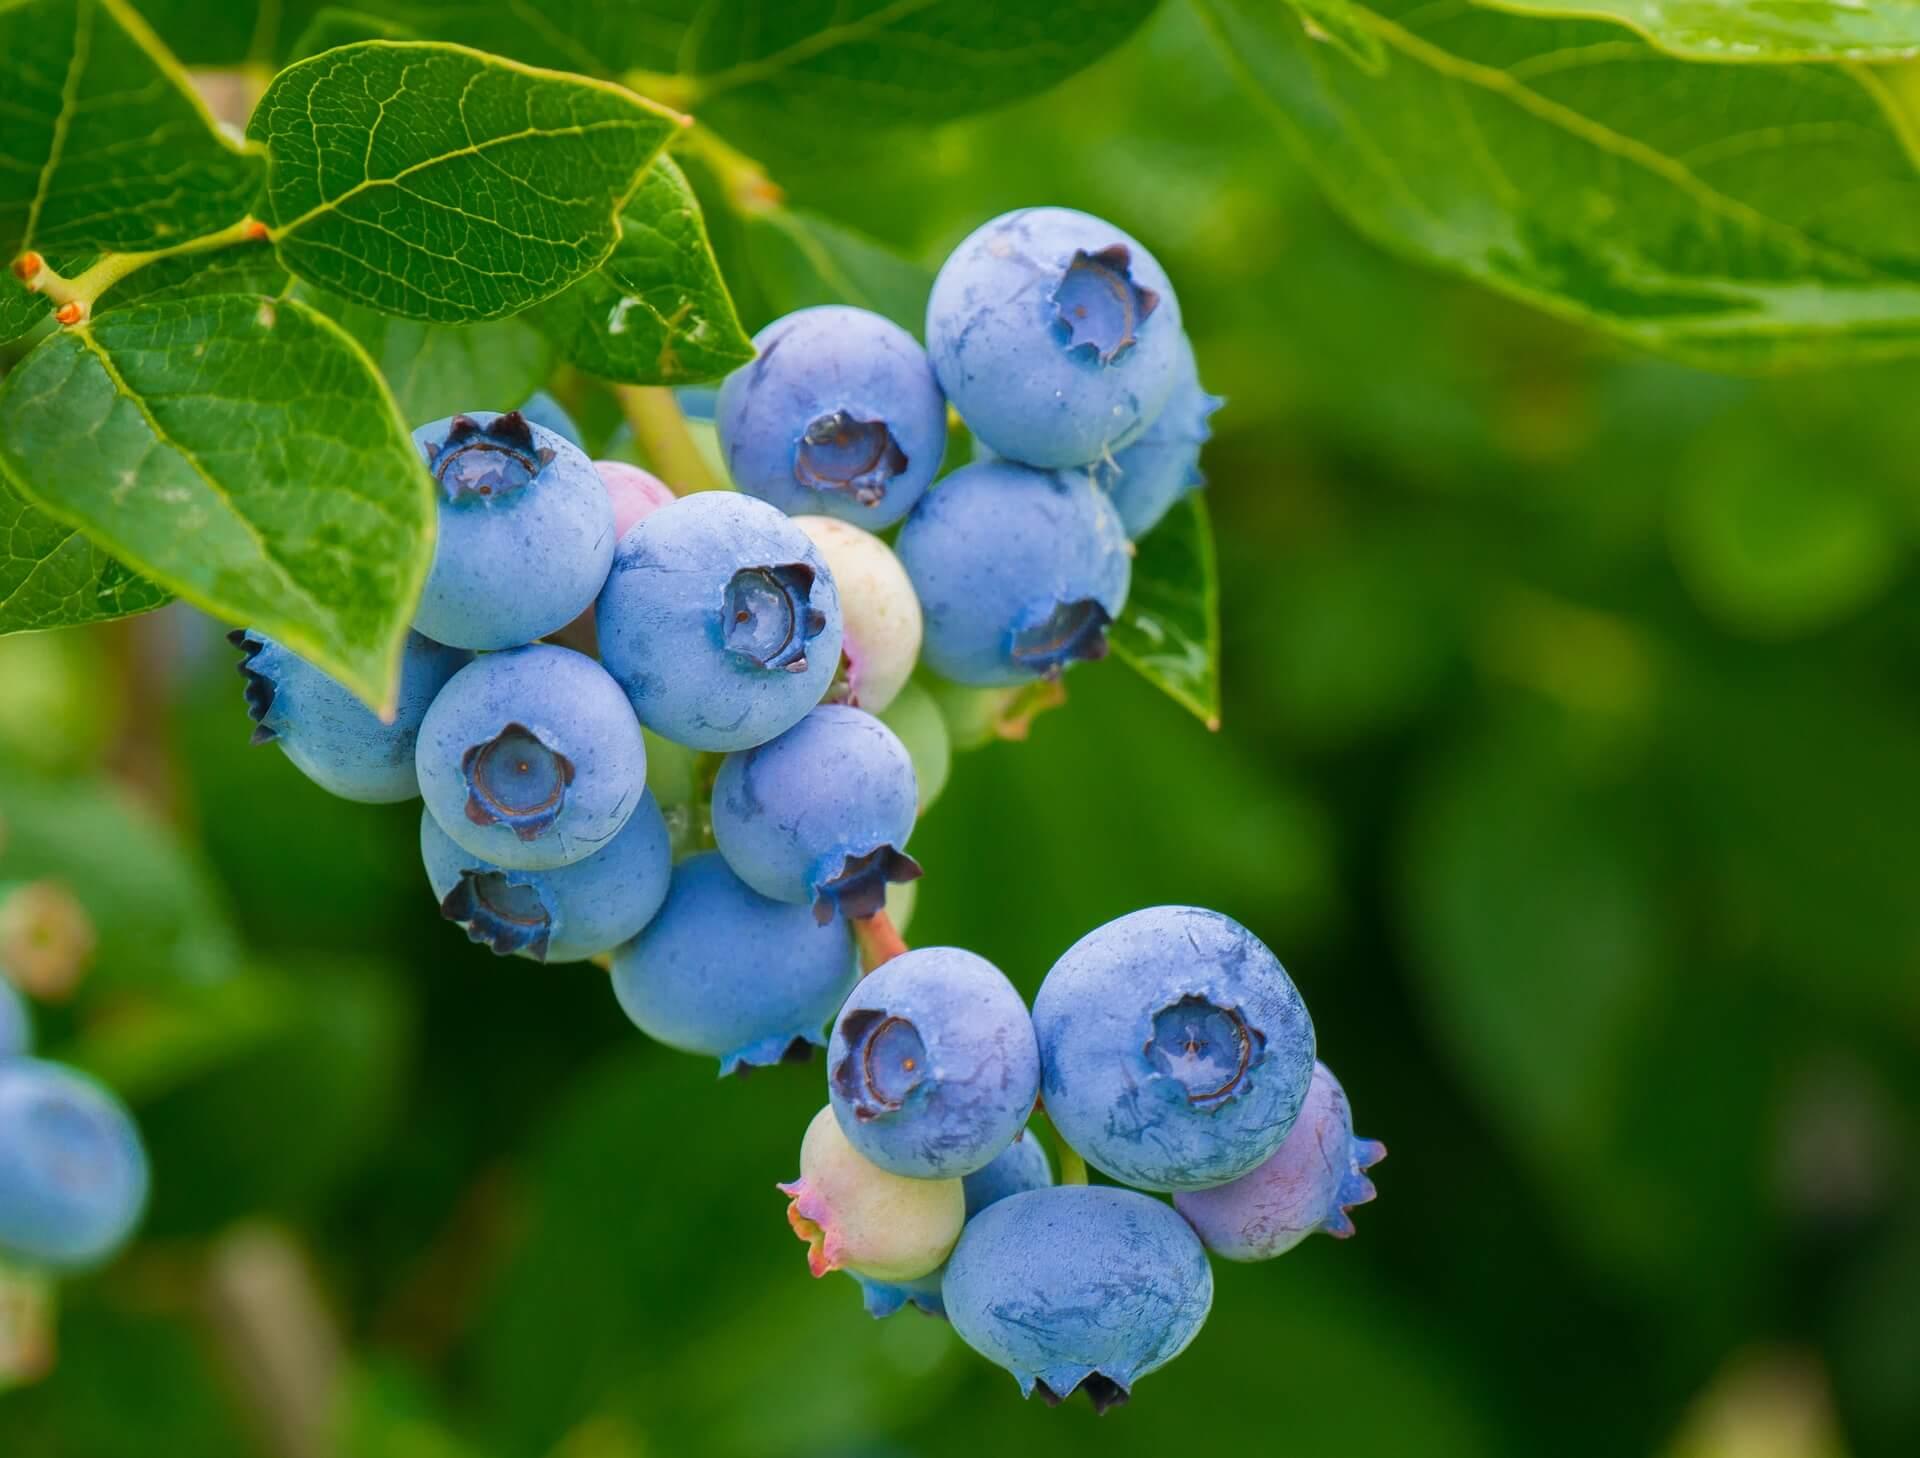 e-archive fresh blueberries